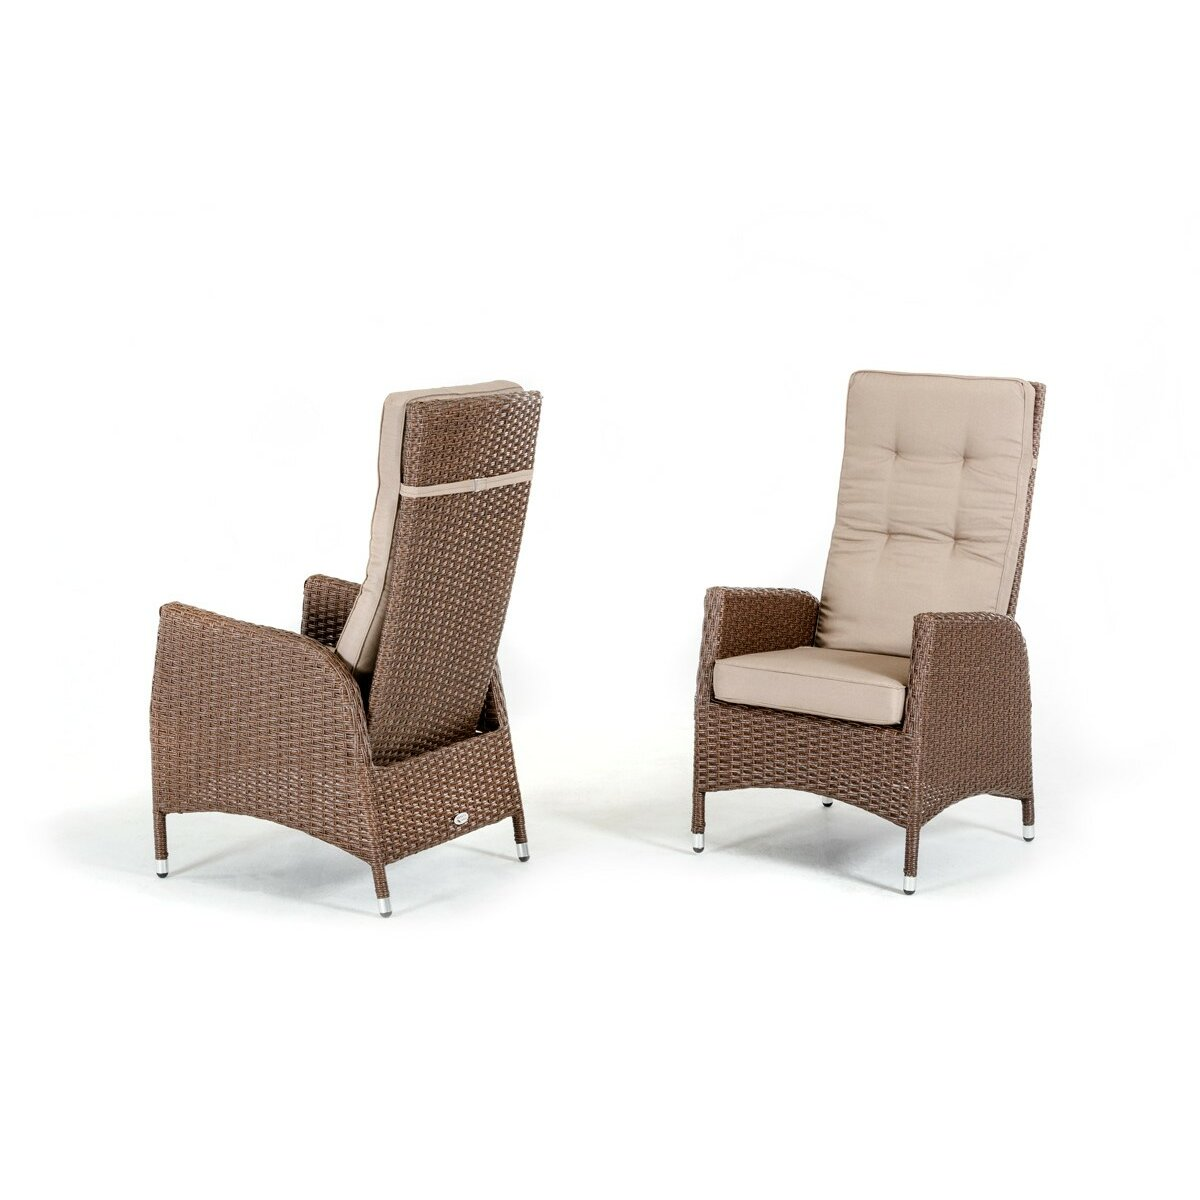 Vig furniture renava toledo 7 piece dining set with for Furniture 7 credit reviews